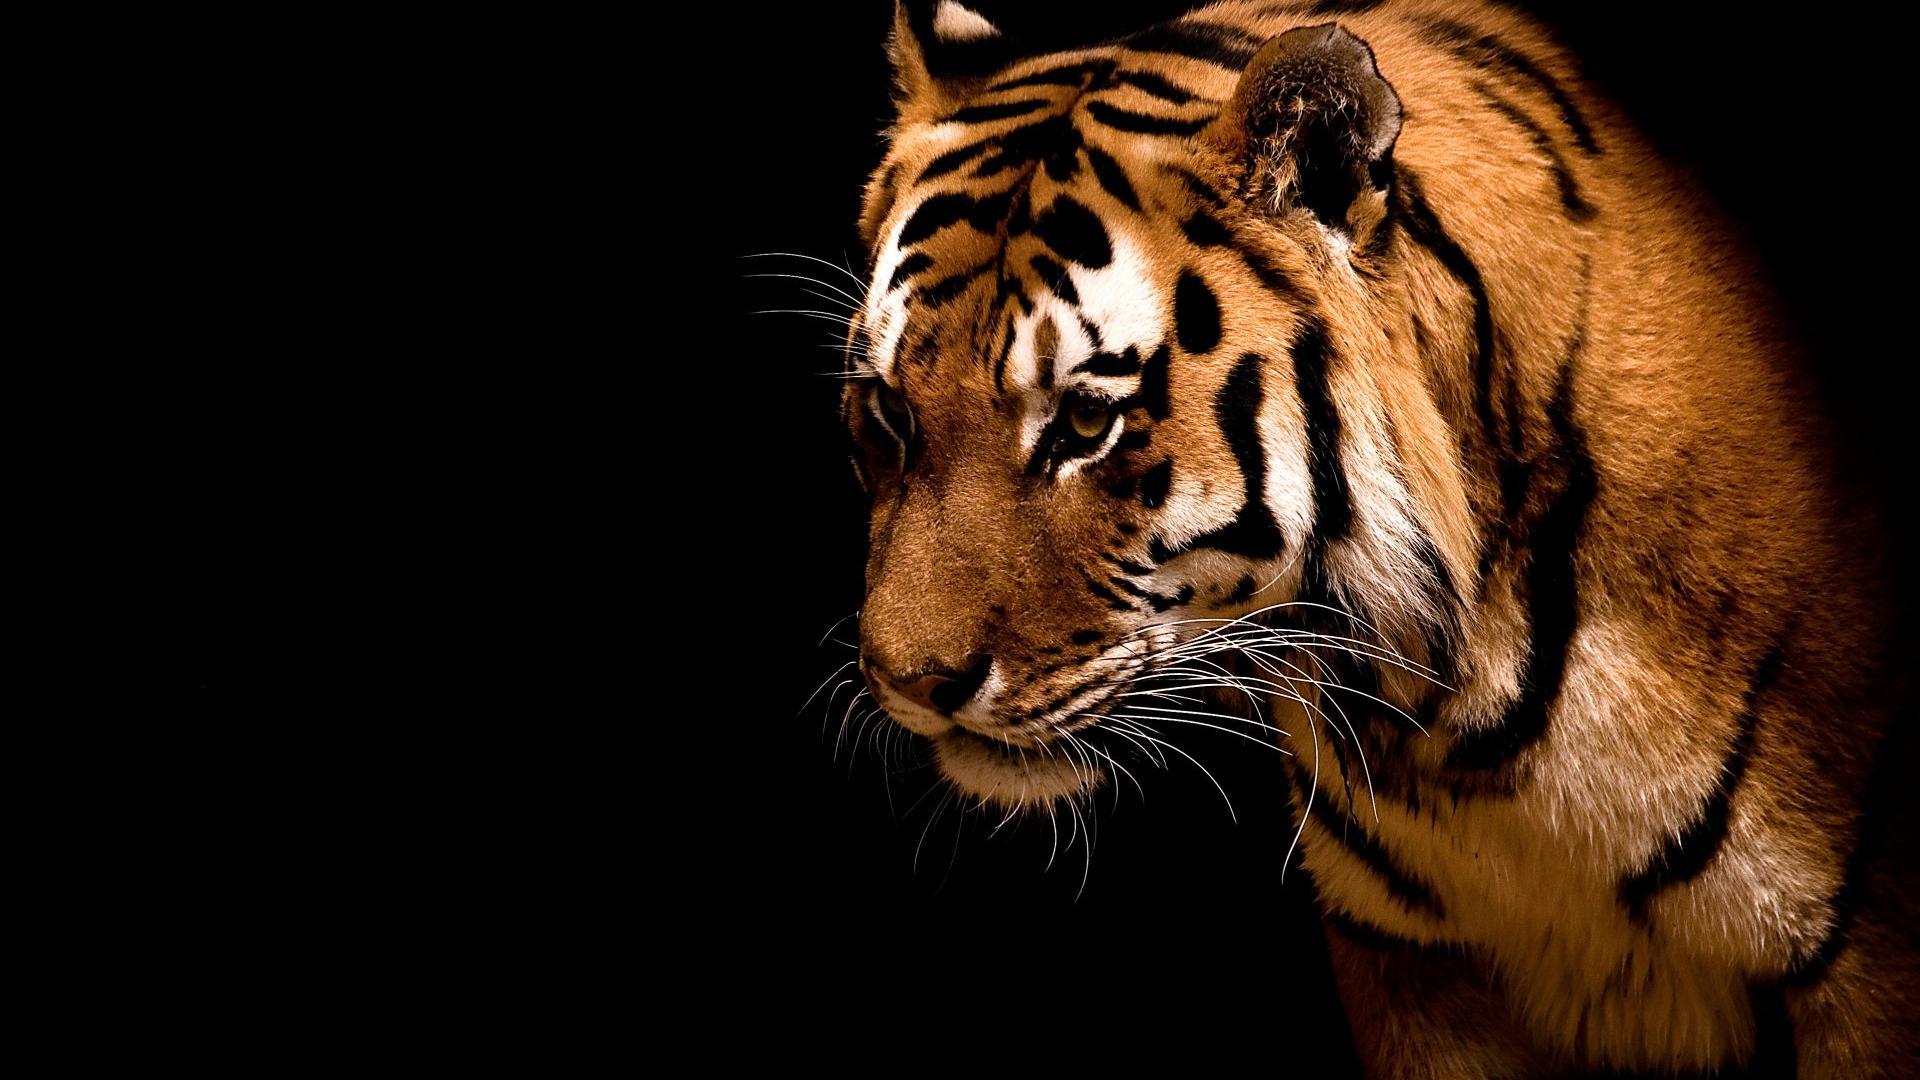 картинки тигра на рабочий стол